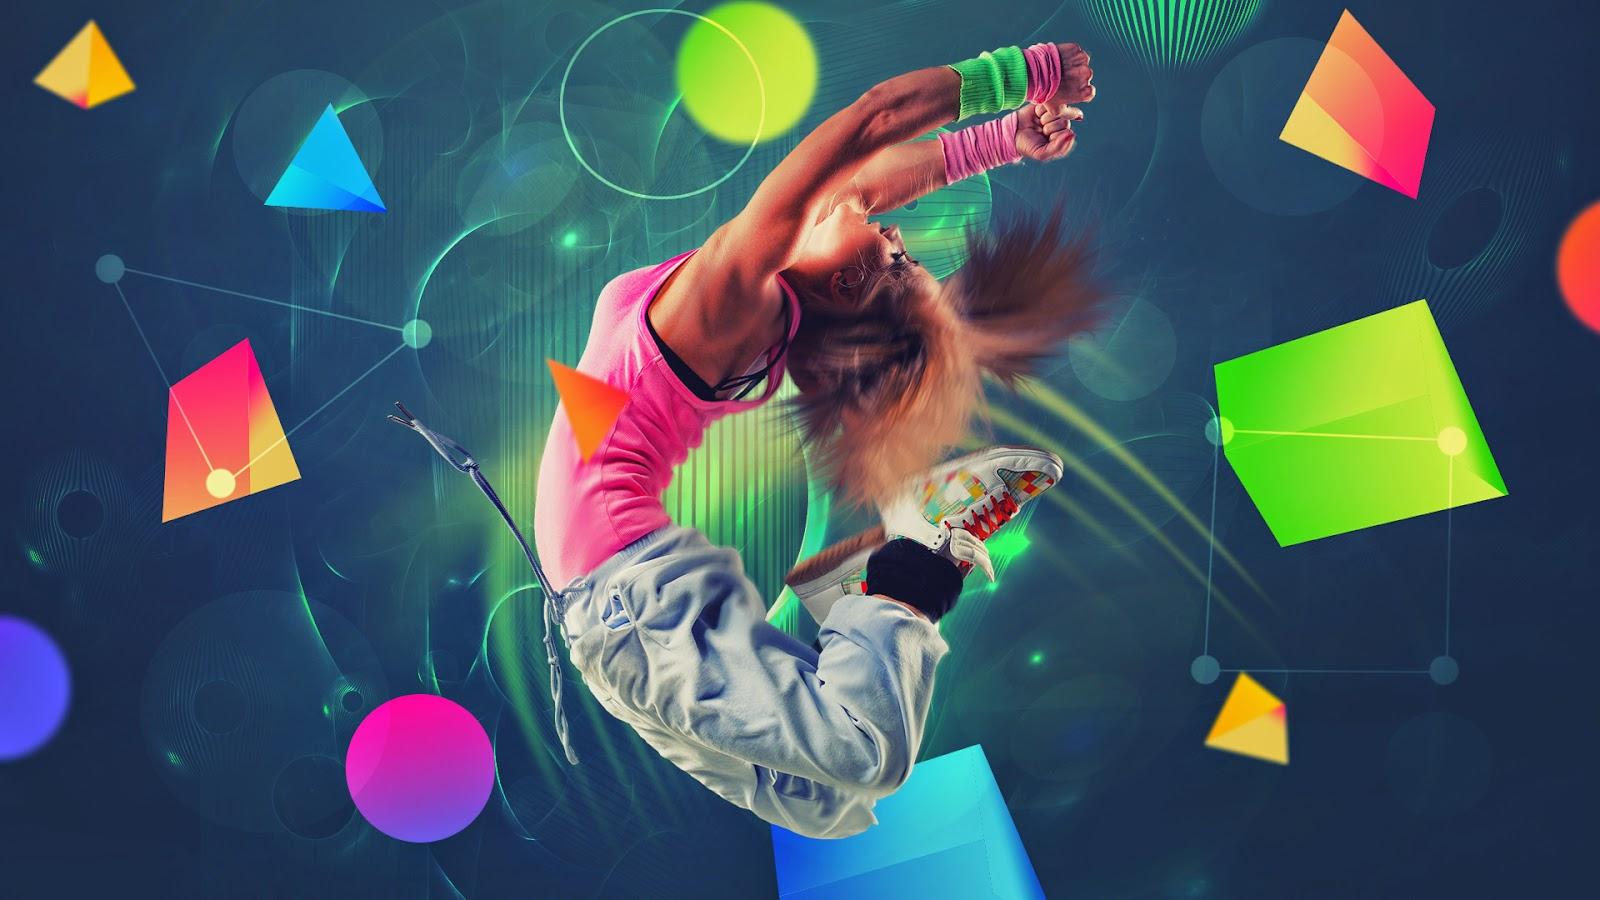 3d Girl Dance Hd Wallpapers: Any Body Can Dance: Hip-hop Dance Wallpapers